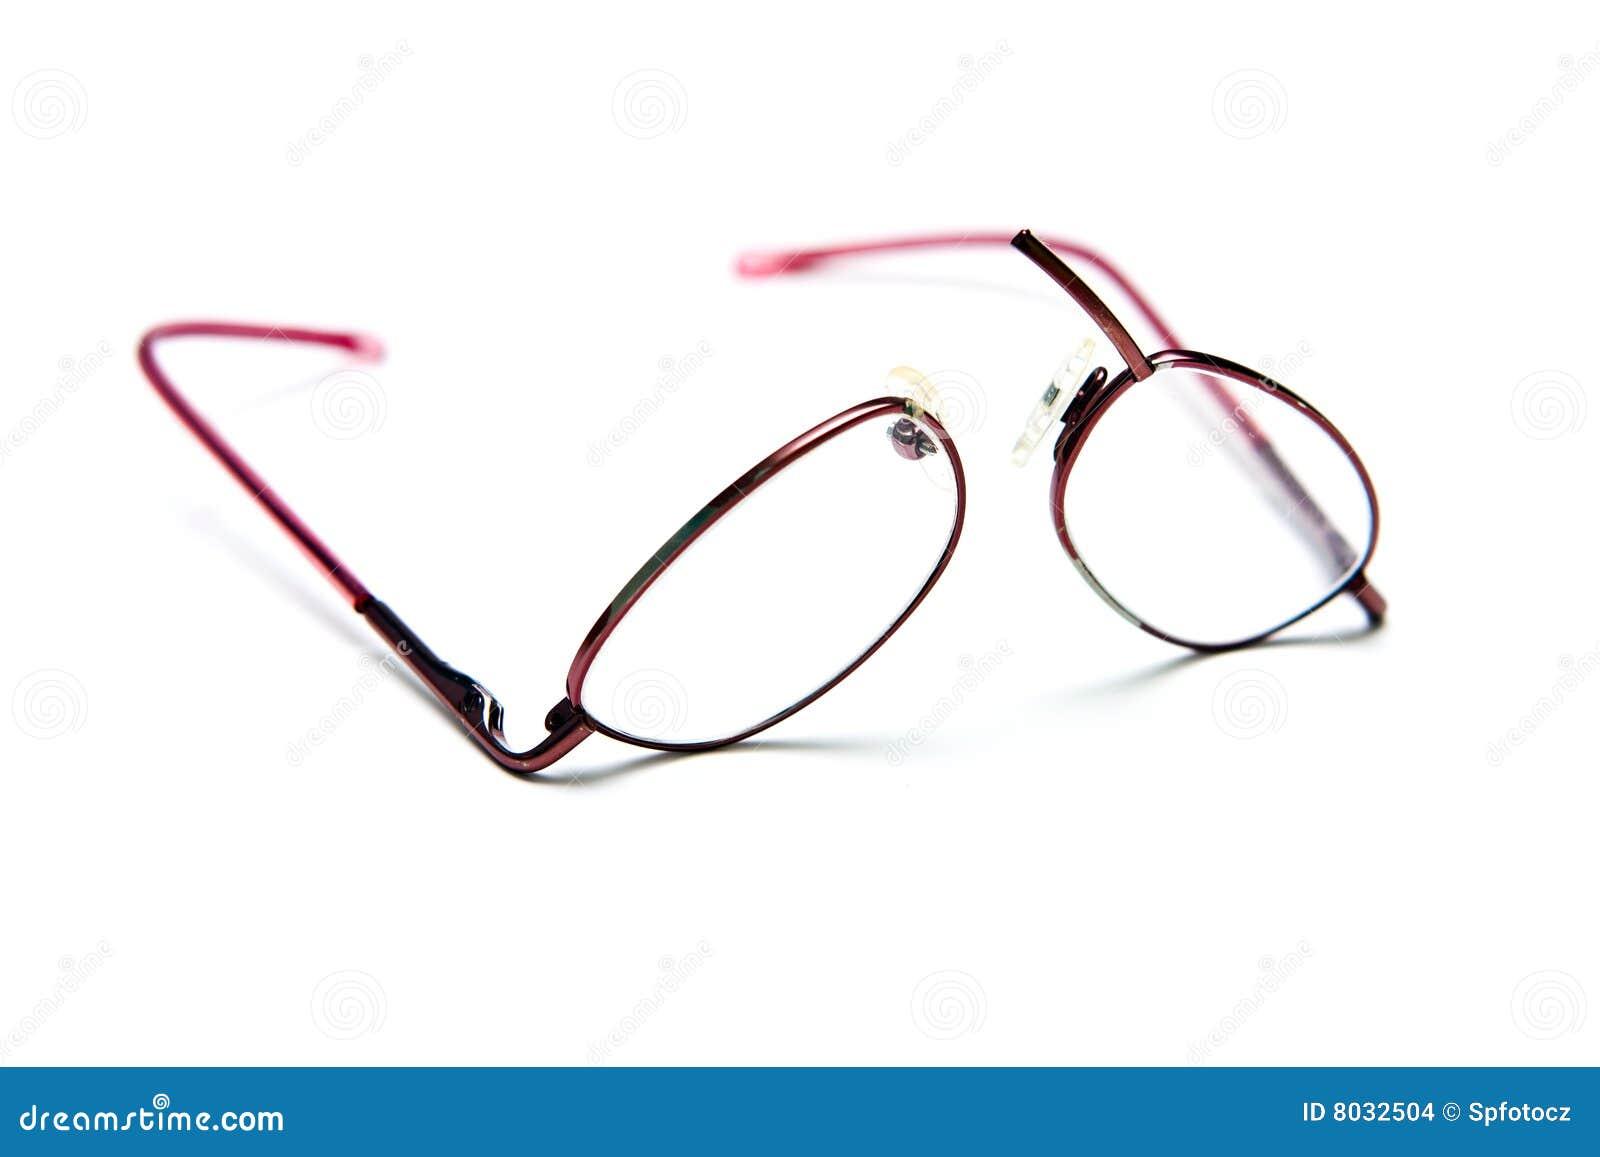 Glasses Frame Cracked : Broken Eyeglasses Stock Images - Image: 8032504